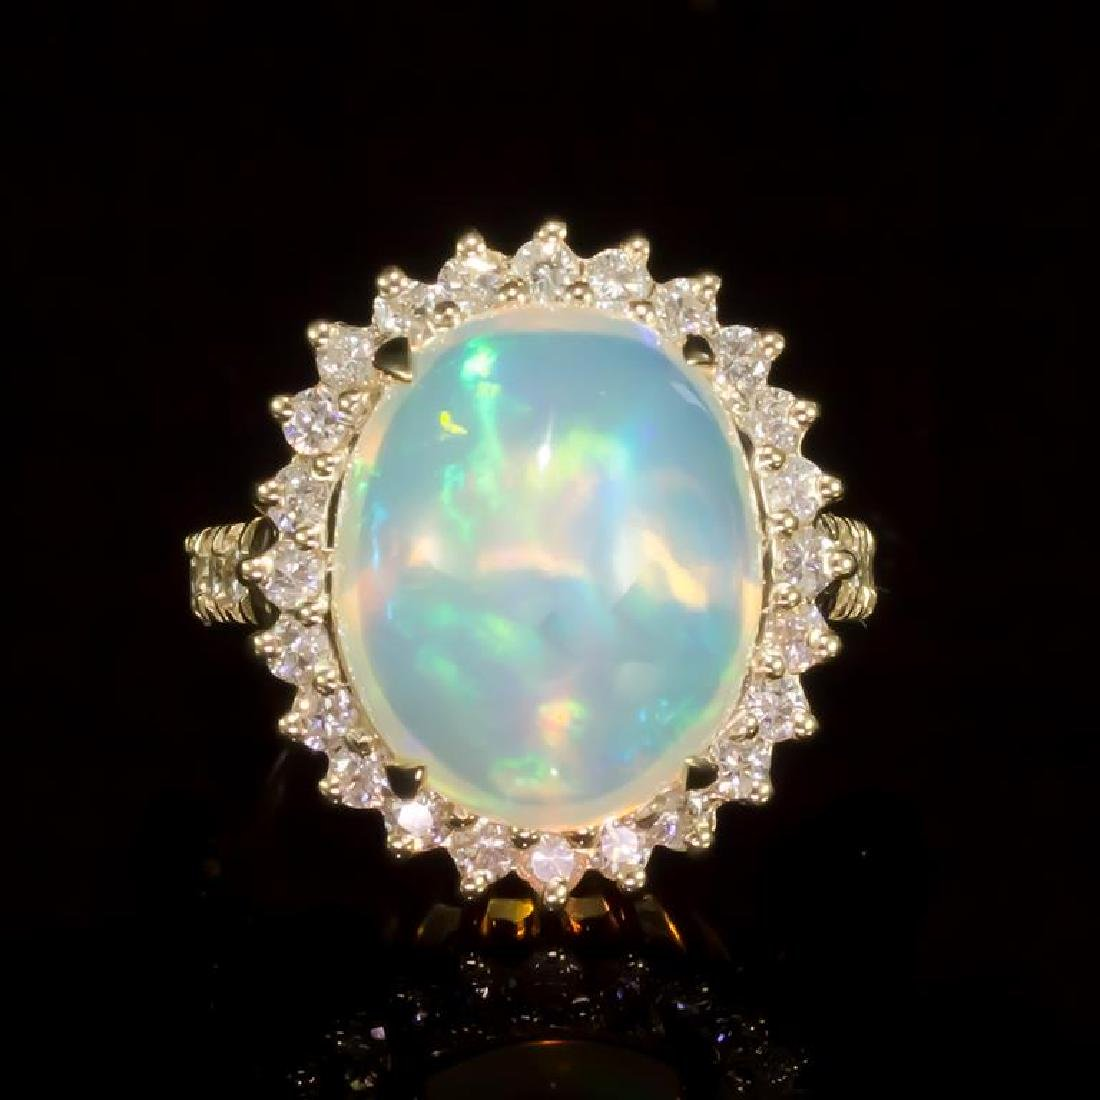 14K Gold 7.02ct Opal 1.11ct Diamond Ring